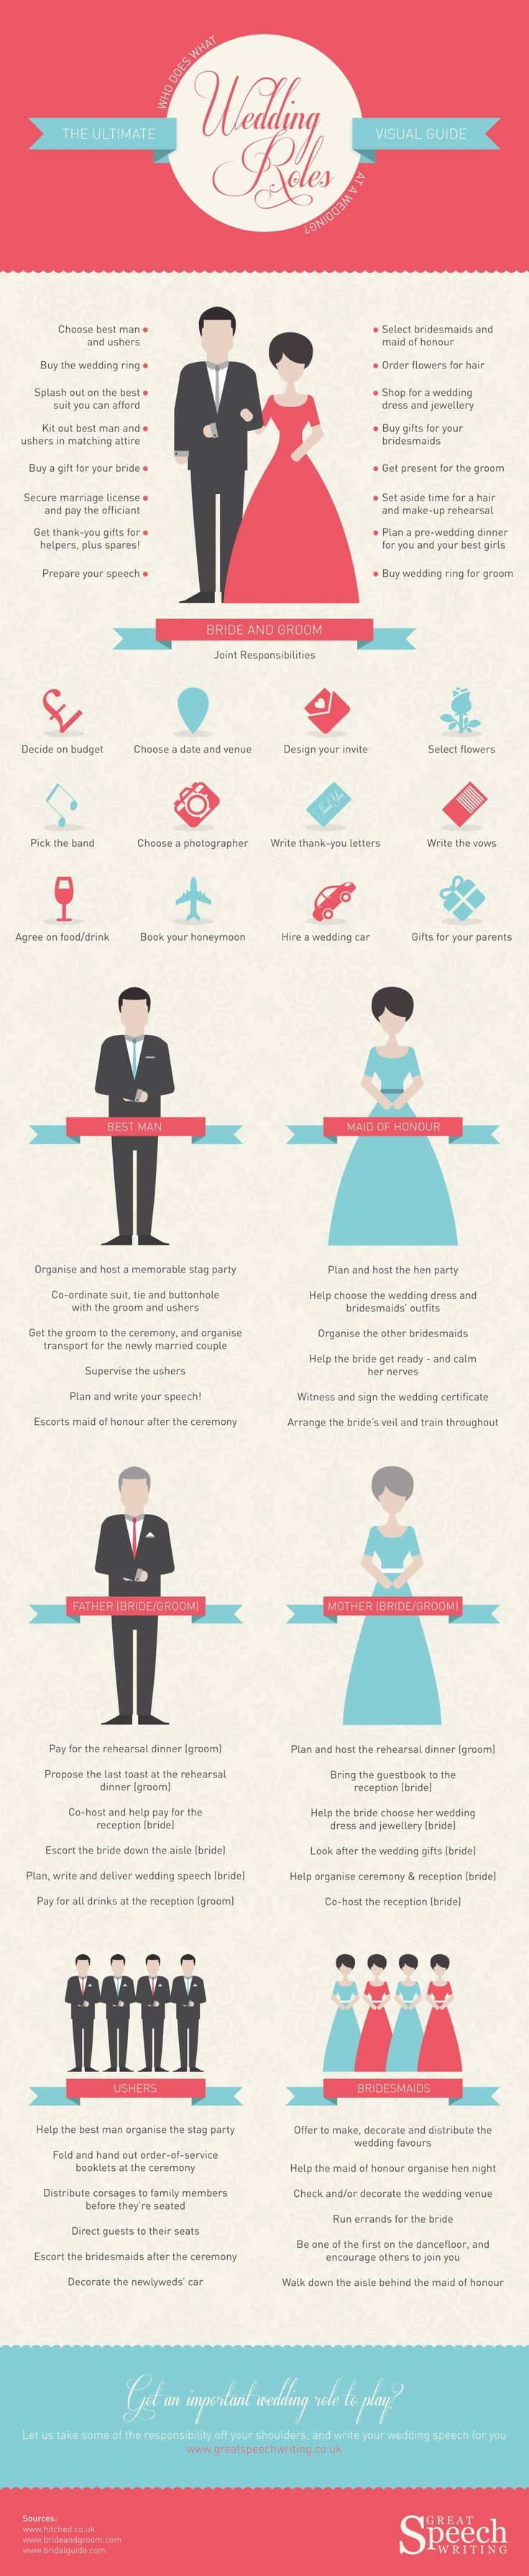 Pop Quiz: Whose Job Is It To Help The Bride Pick Her Wedding Jewelry?